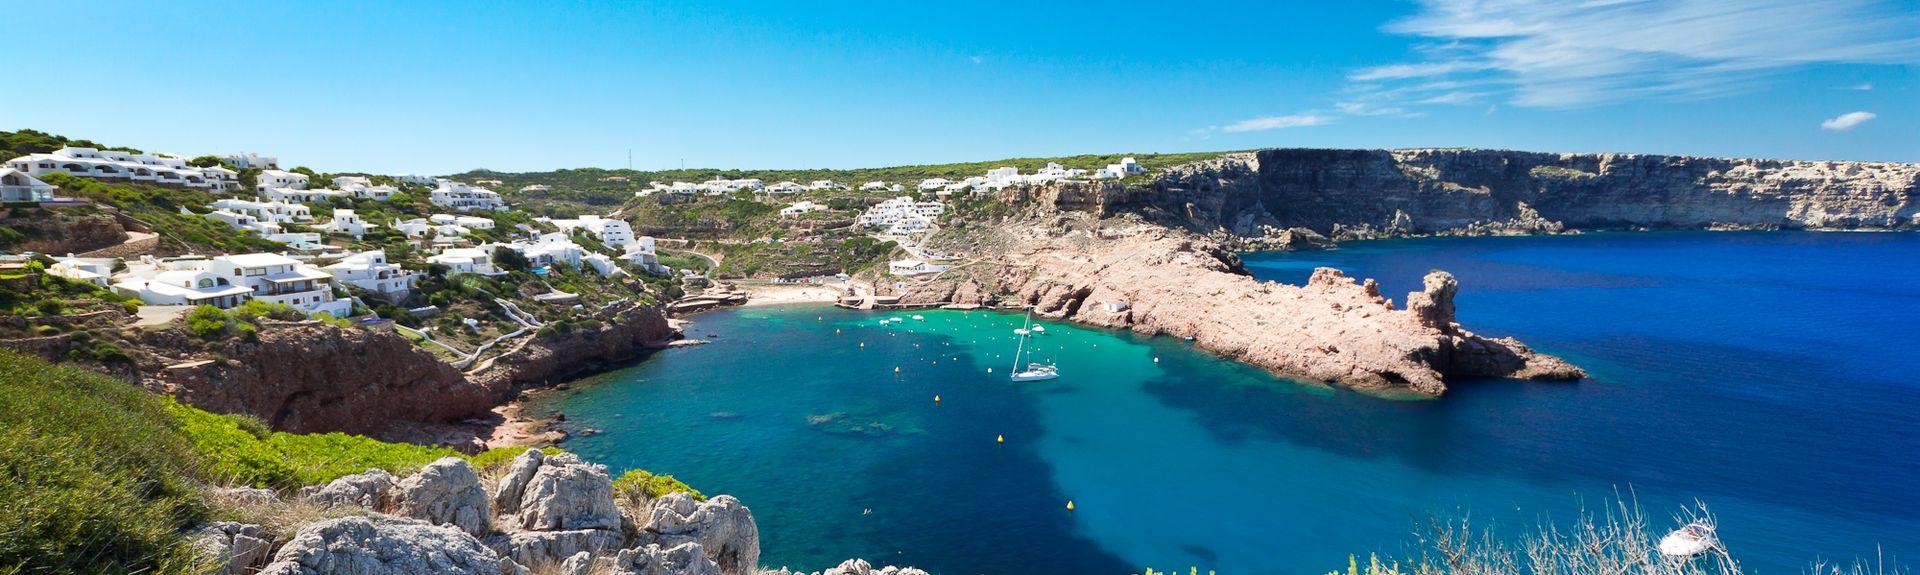 Son Carrió, Ciutadella de Menorca, Baléares, Espagne